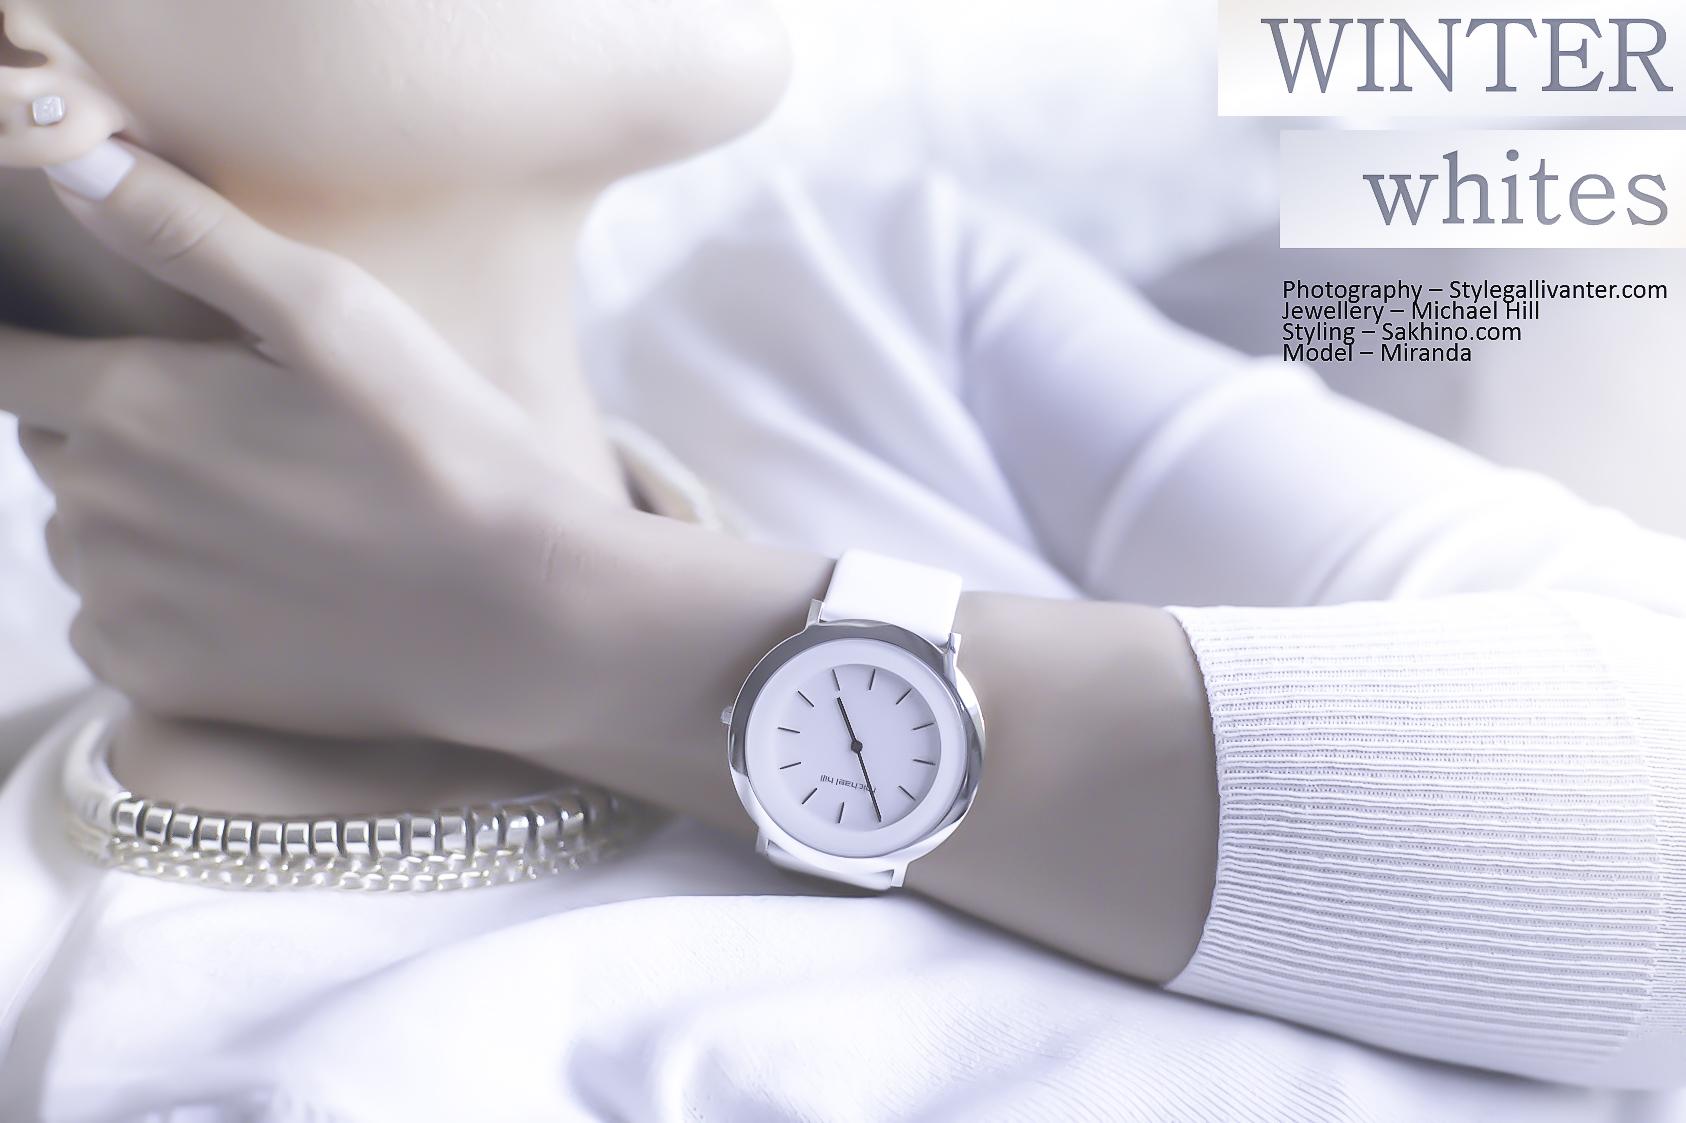 jewellery-trends-2015_michael-hill-fashion-bloggers_style-gallavanter_melbourne's-top-bloggers-2015_copyright-2015_miranda-sakhino-blog_michael-hill-blogger_best-contemporary-jewellery-19